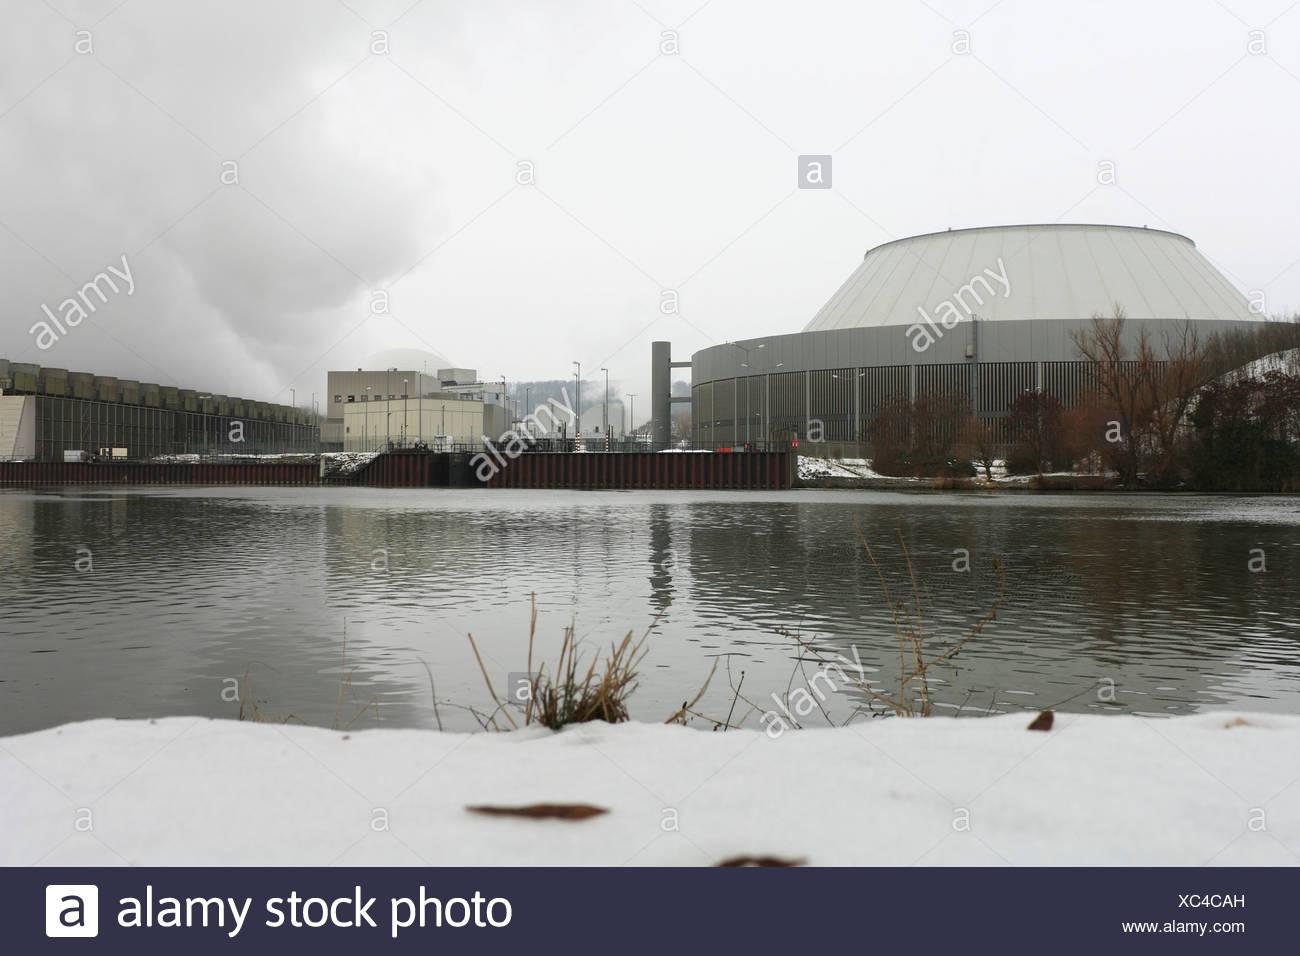 Nuclear power plant Neckarwestheim on the Neckar river, Neckarwestheim, Baden-Wuerttemberg, Germany, Europe - Stock Image